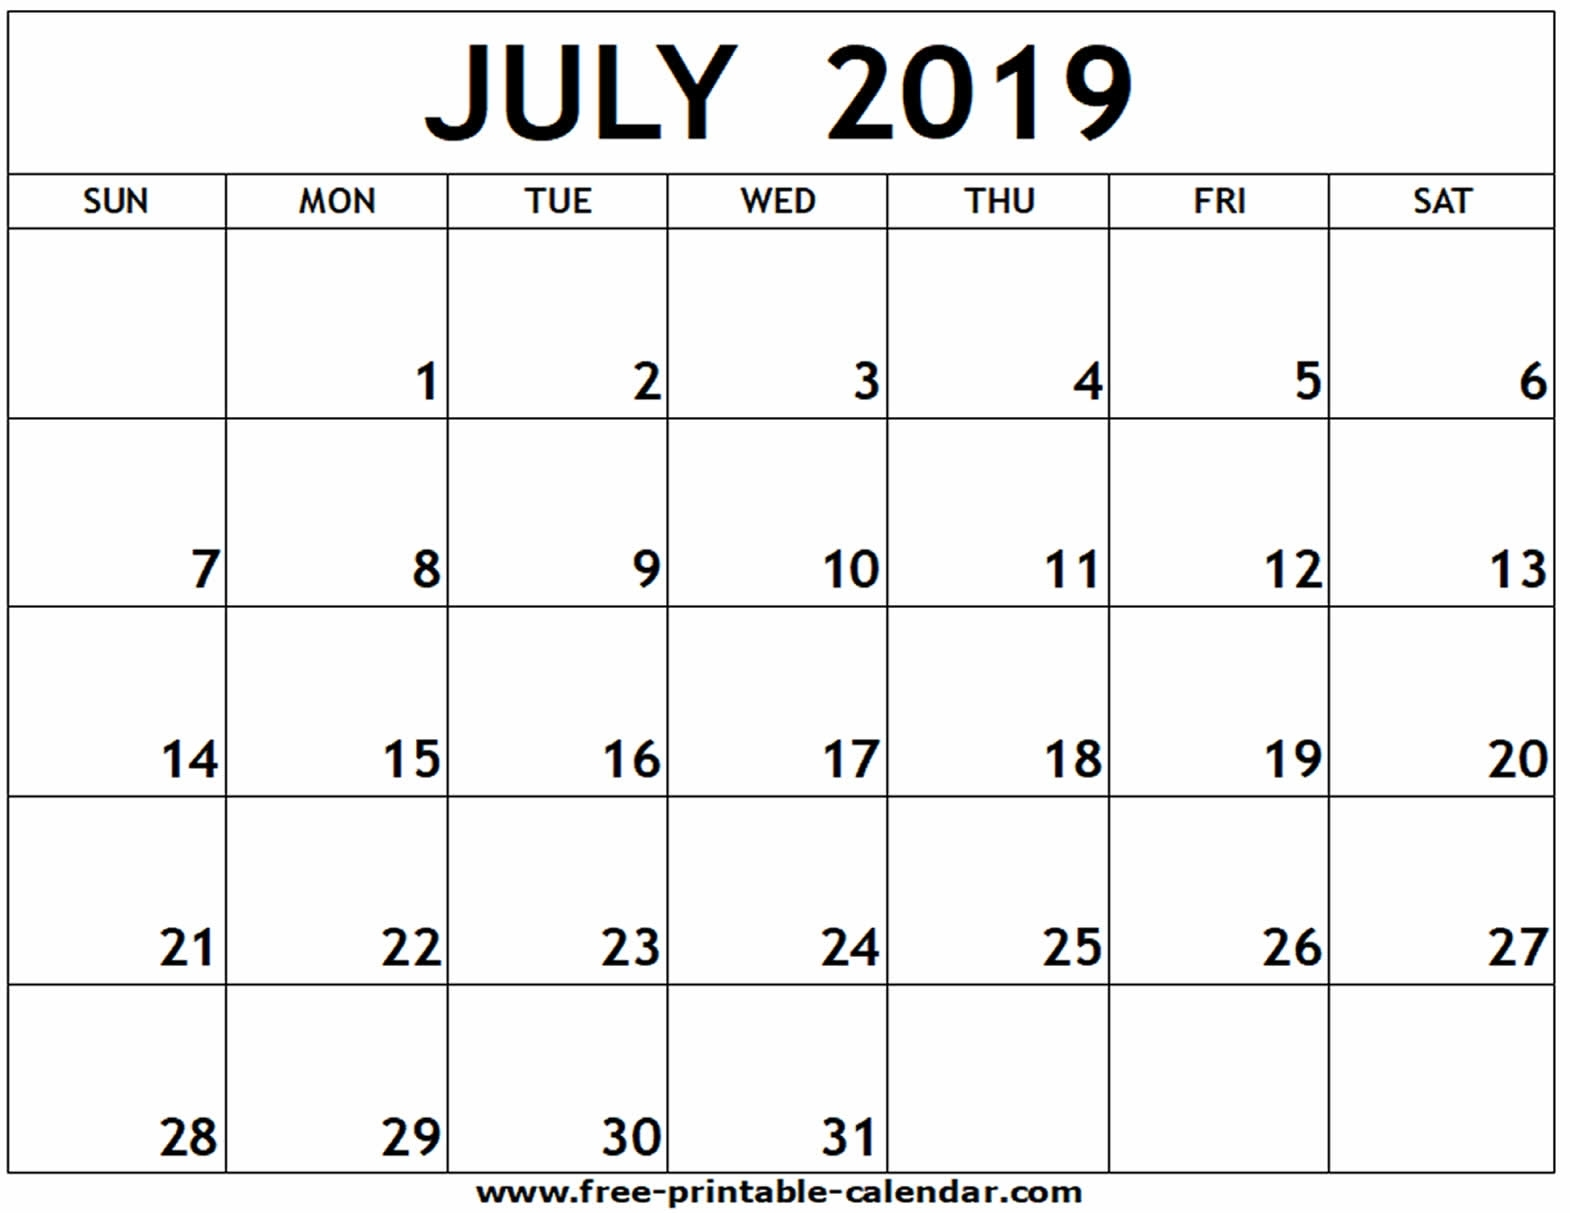 July 2019 Printable Calendar - Free-Printable-Calendar pertaining to June And July Printable Calendars